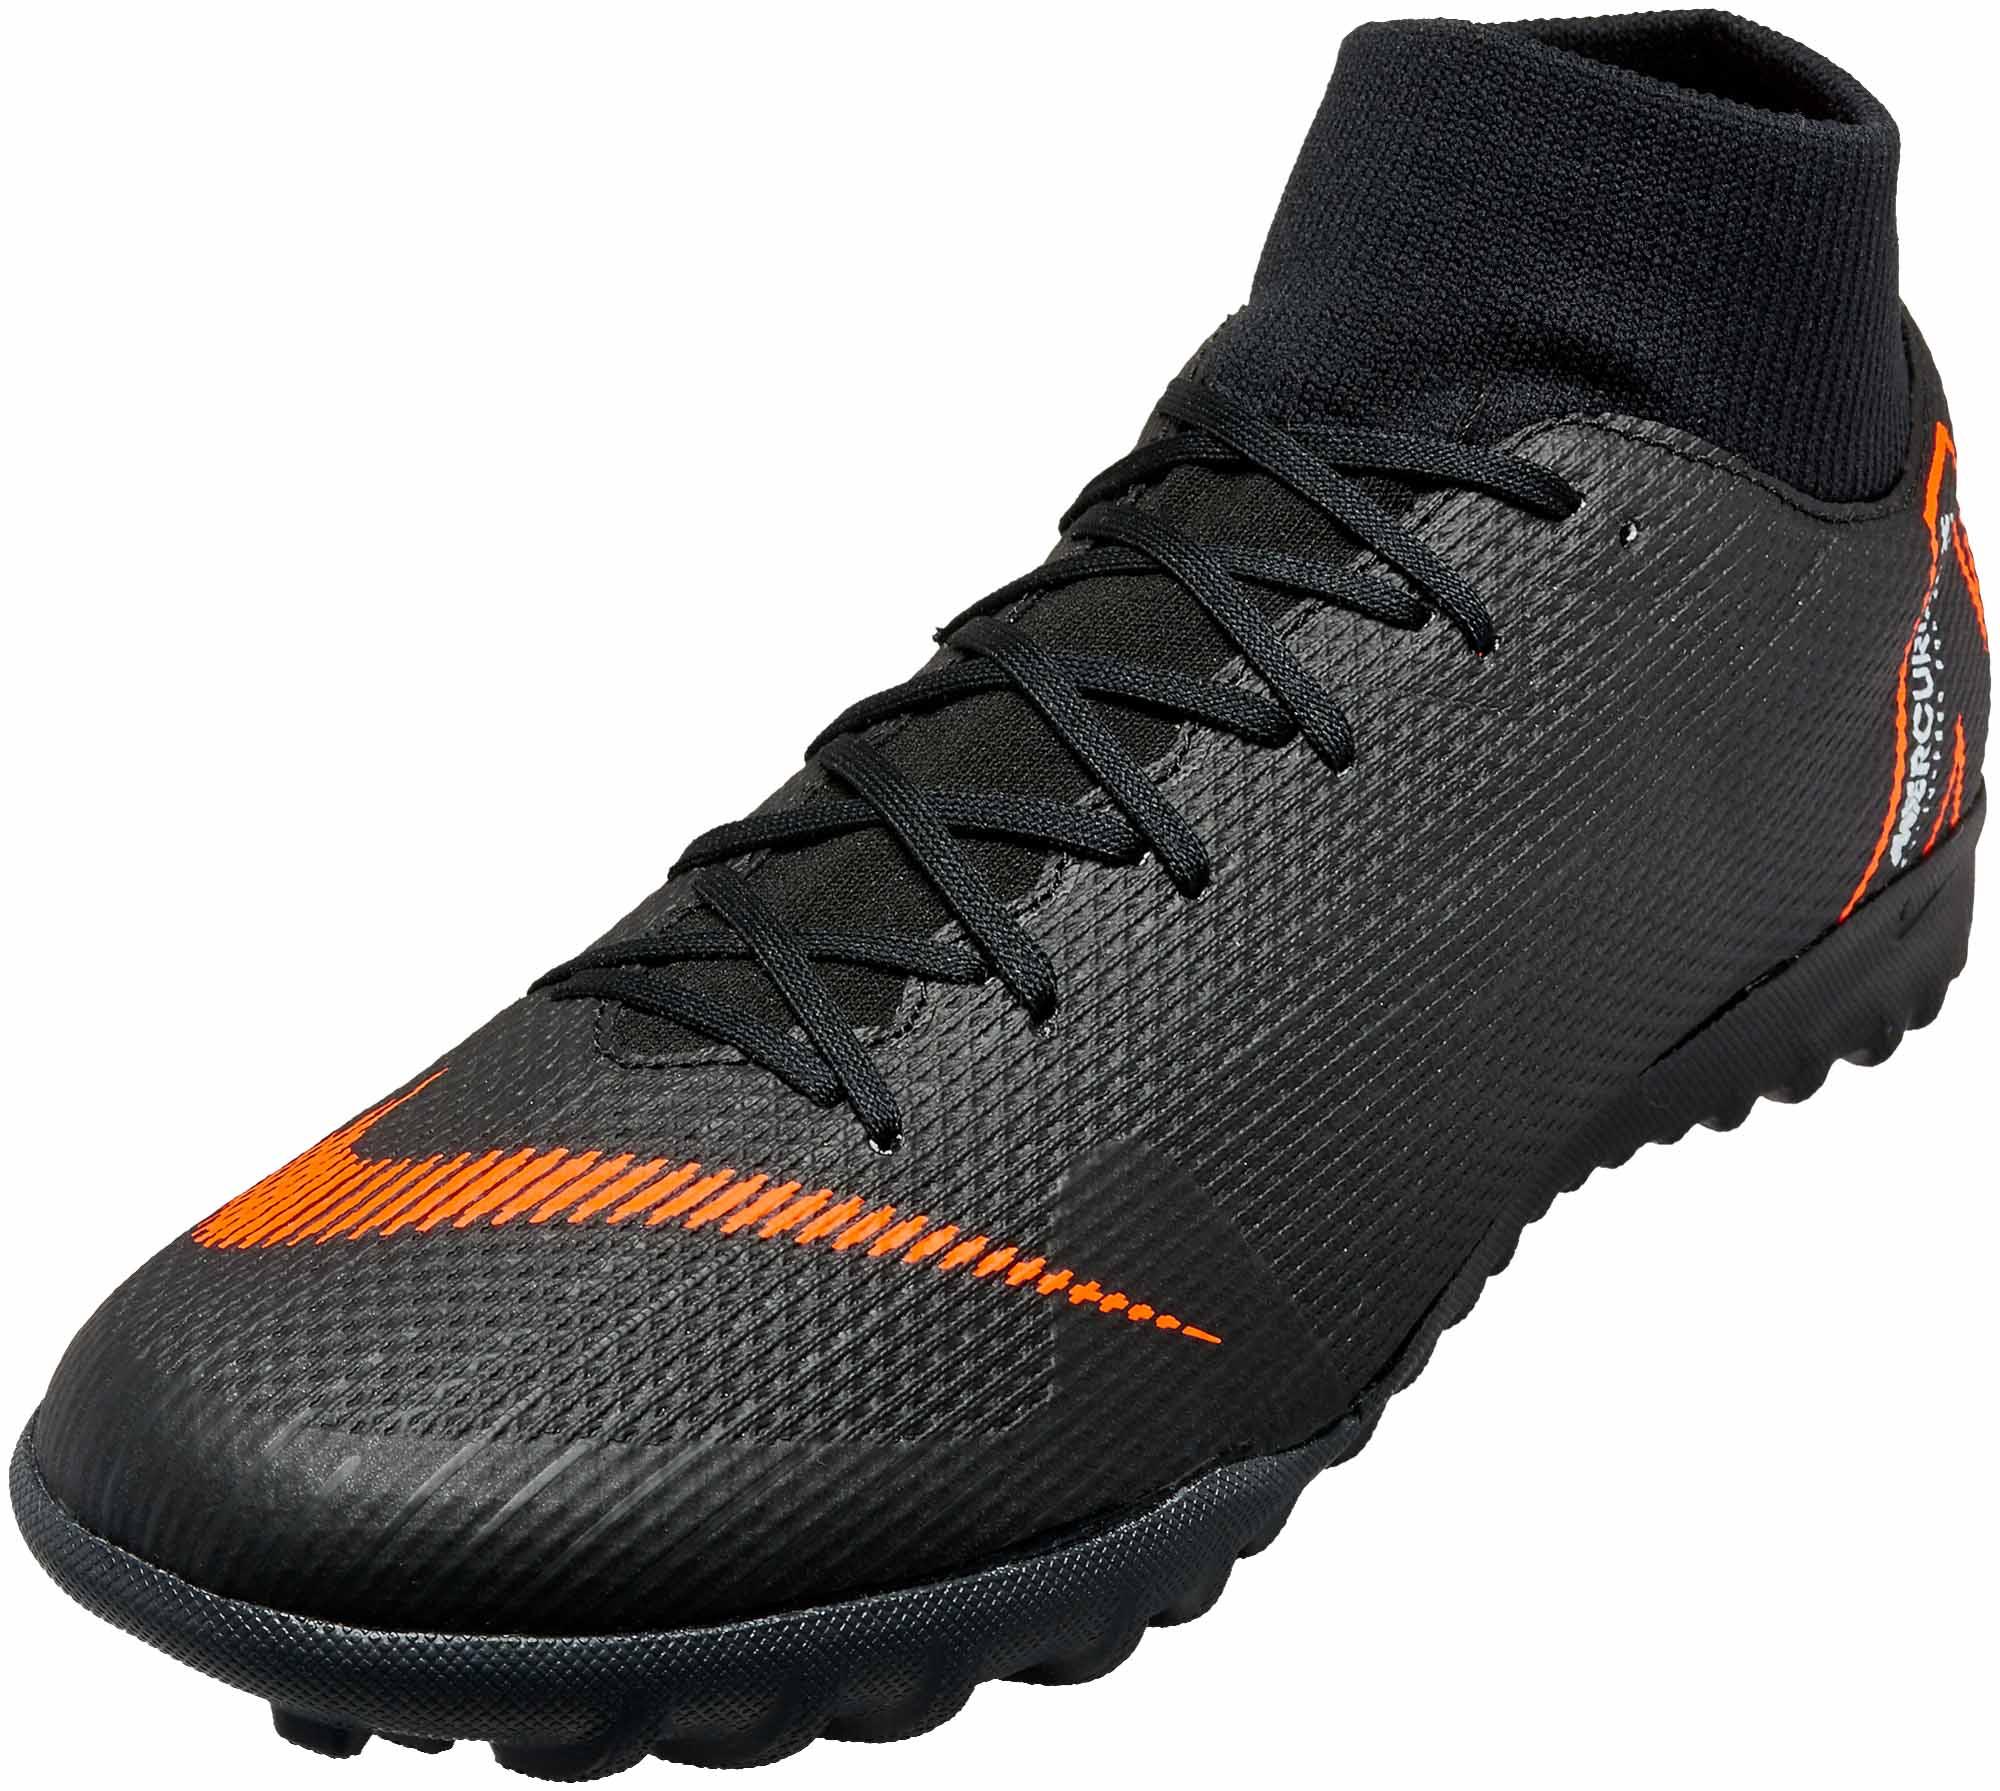 05b7f0604c Nike SuperflyX 6 Academy TF - Black Total Orange - SoccerPro